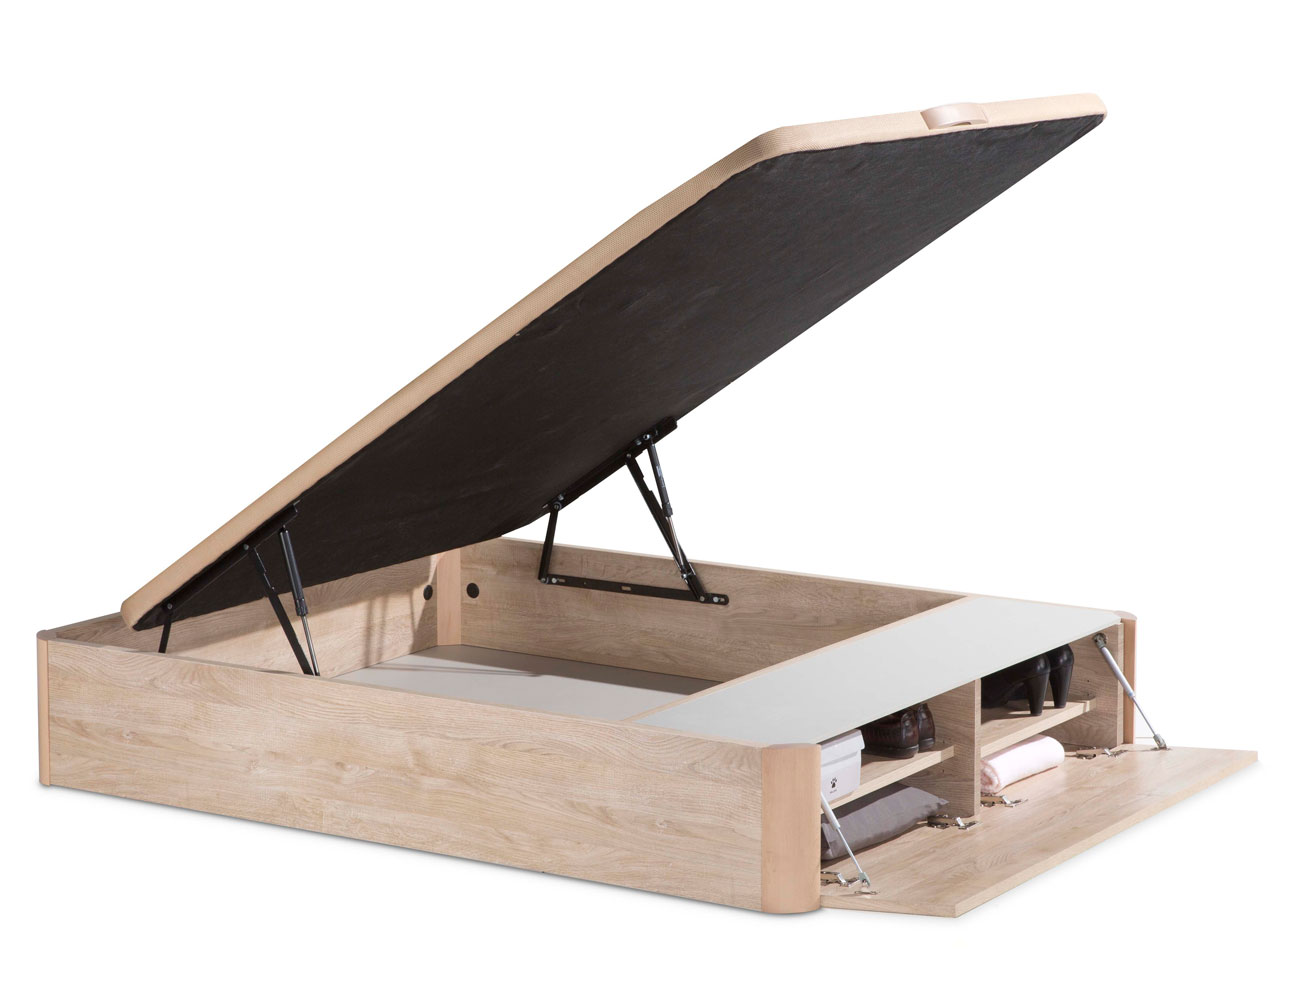 Canape zapatero madera tapa 3d 76